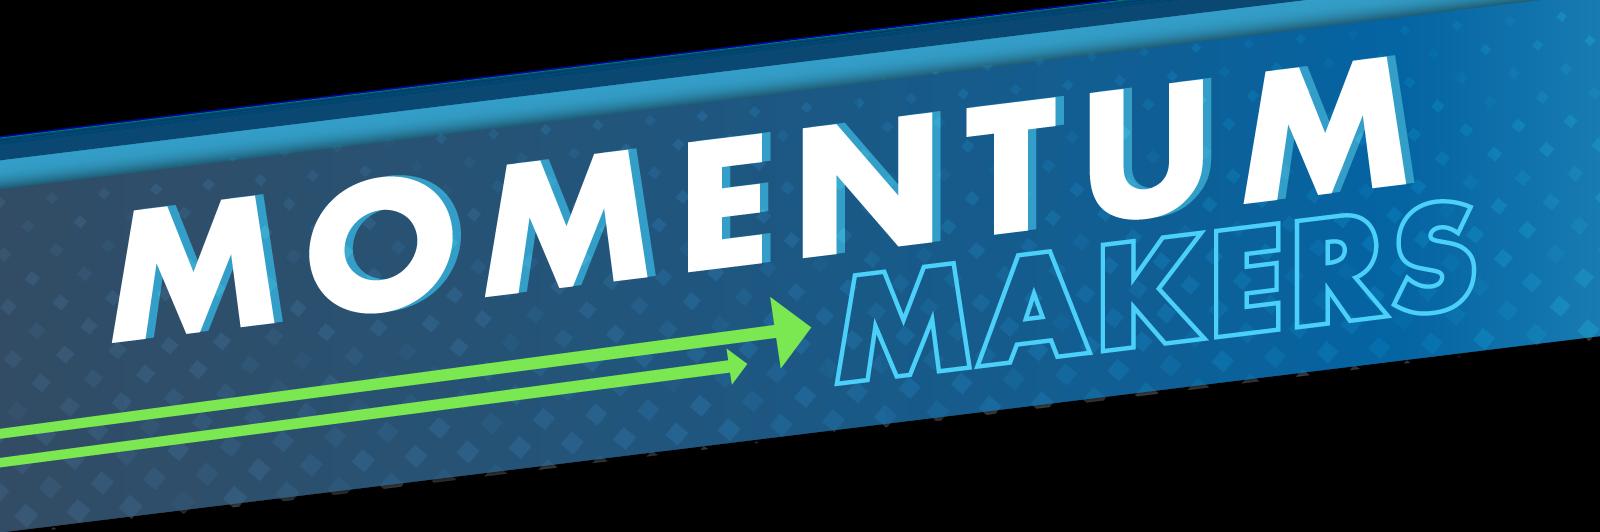 Momentum-Makers-web-banner